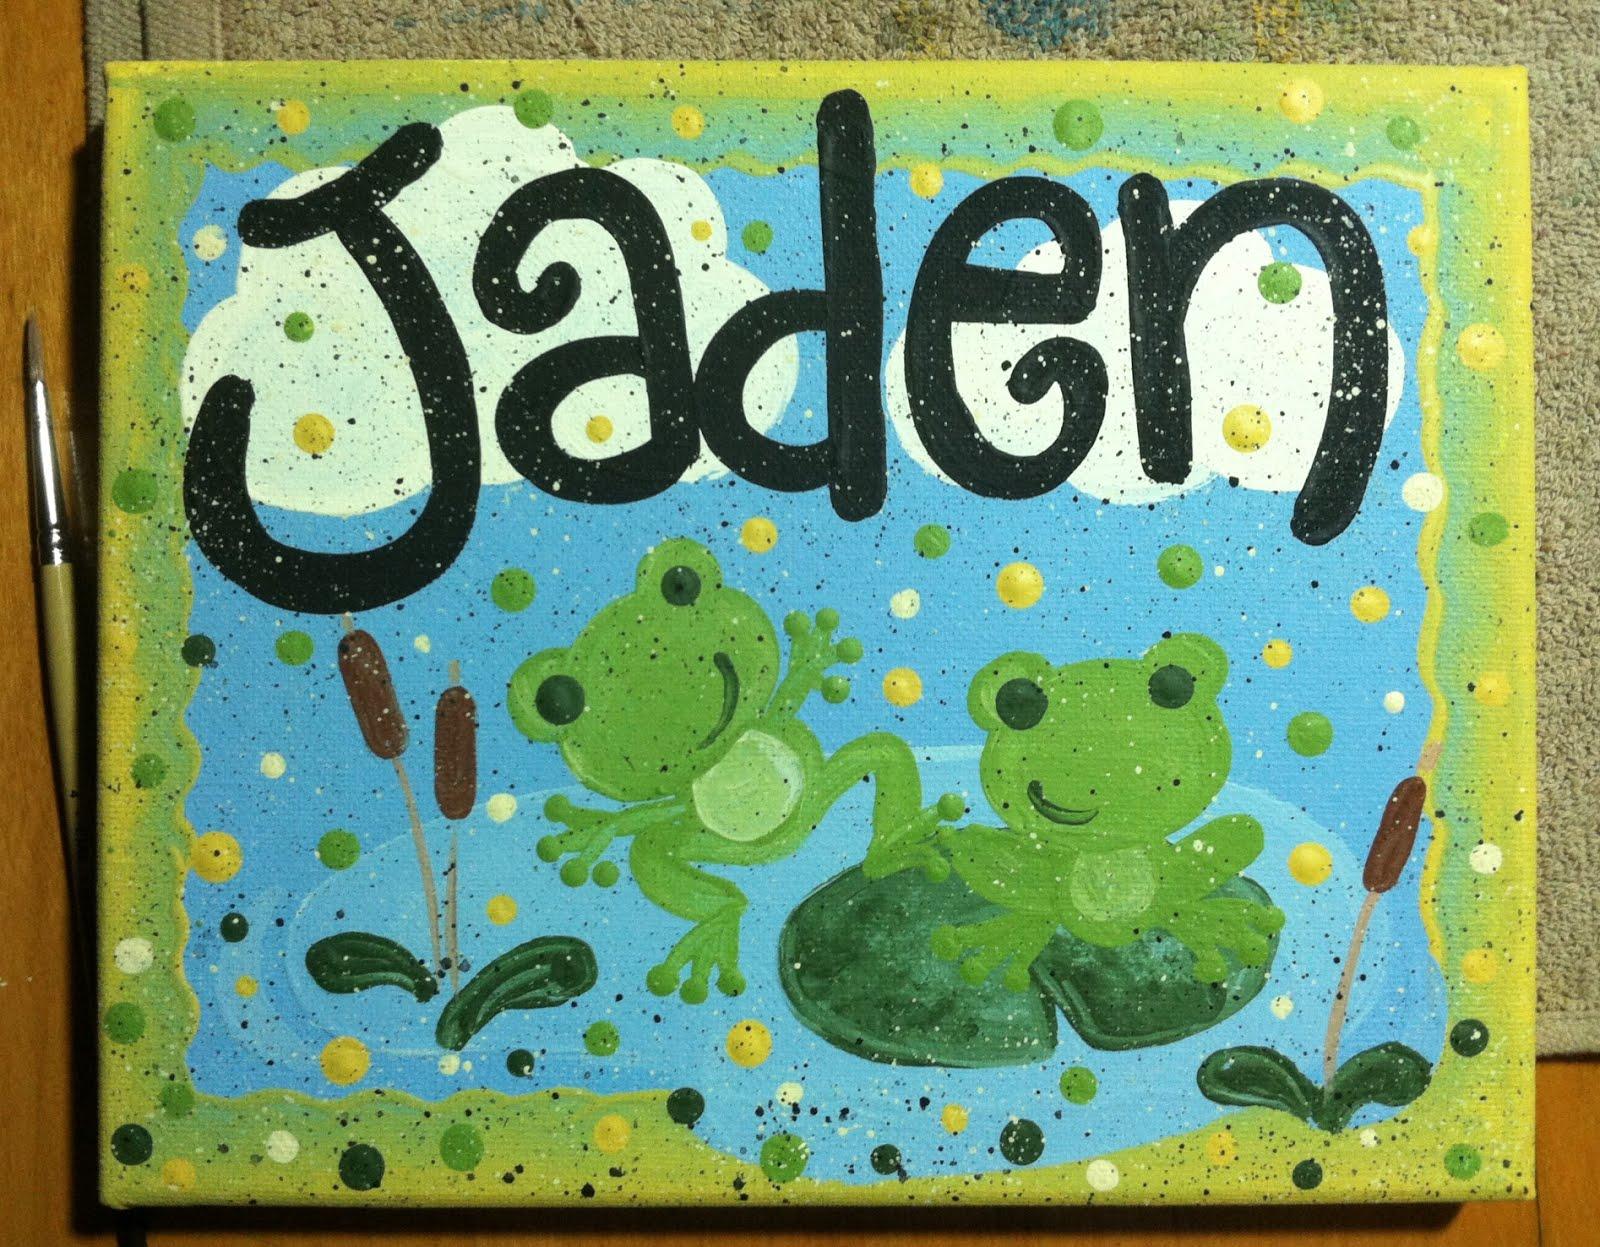 http://kimbade.blogspot.com/2012/10/blog-post.html